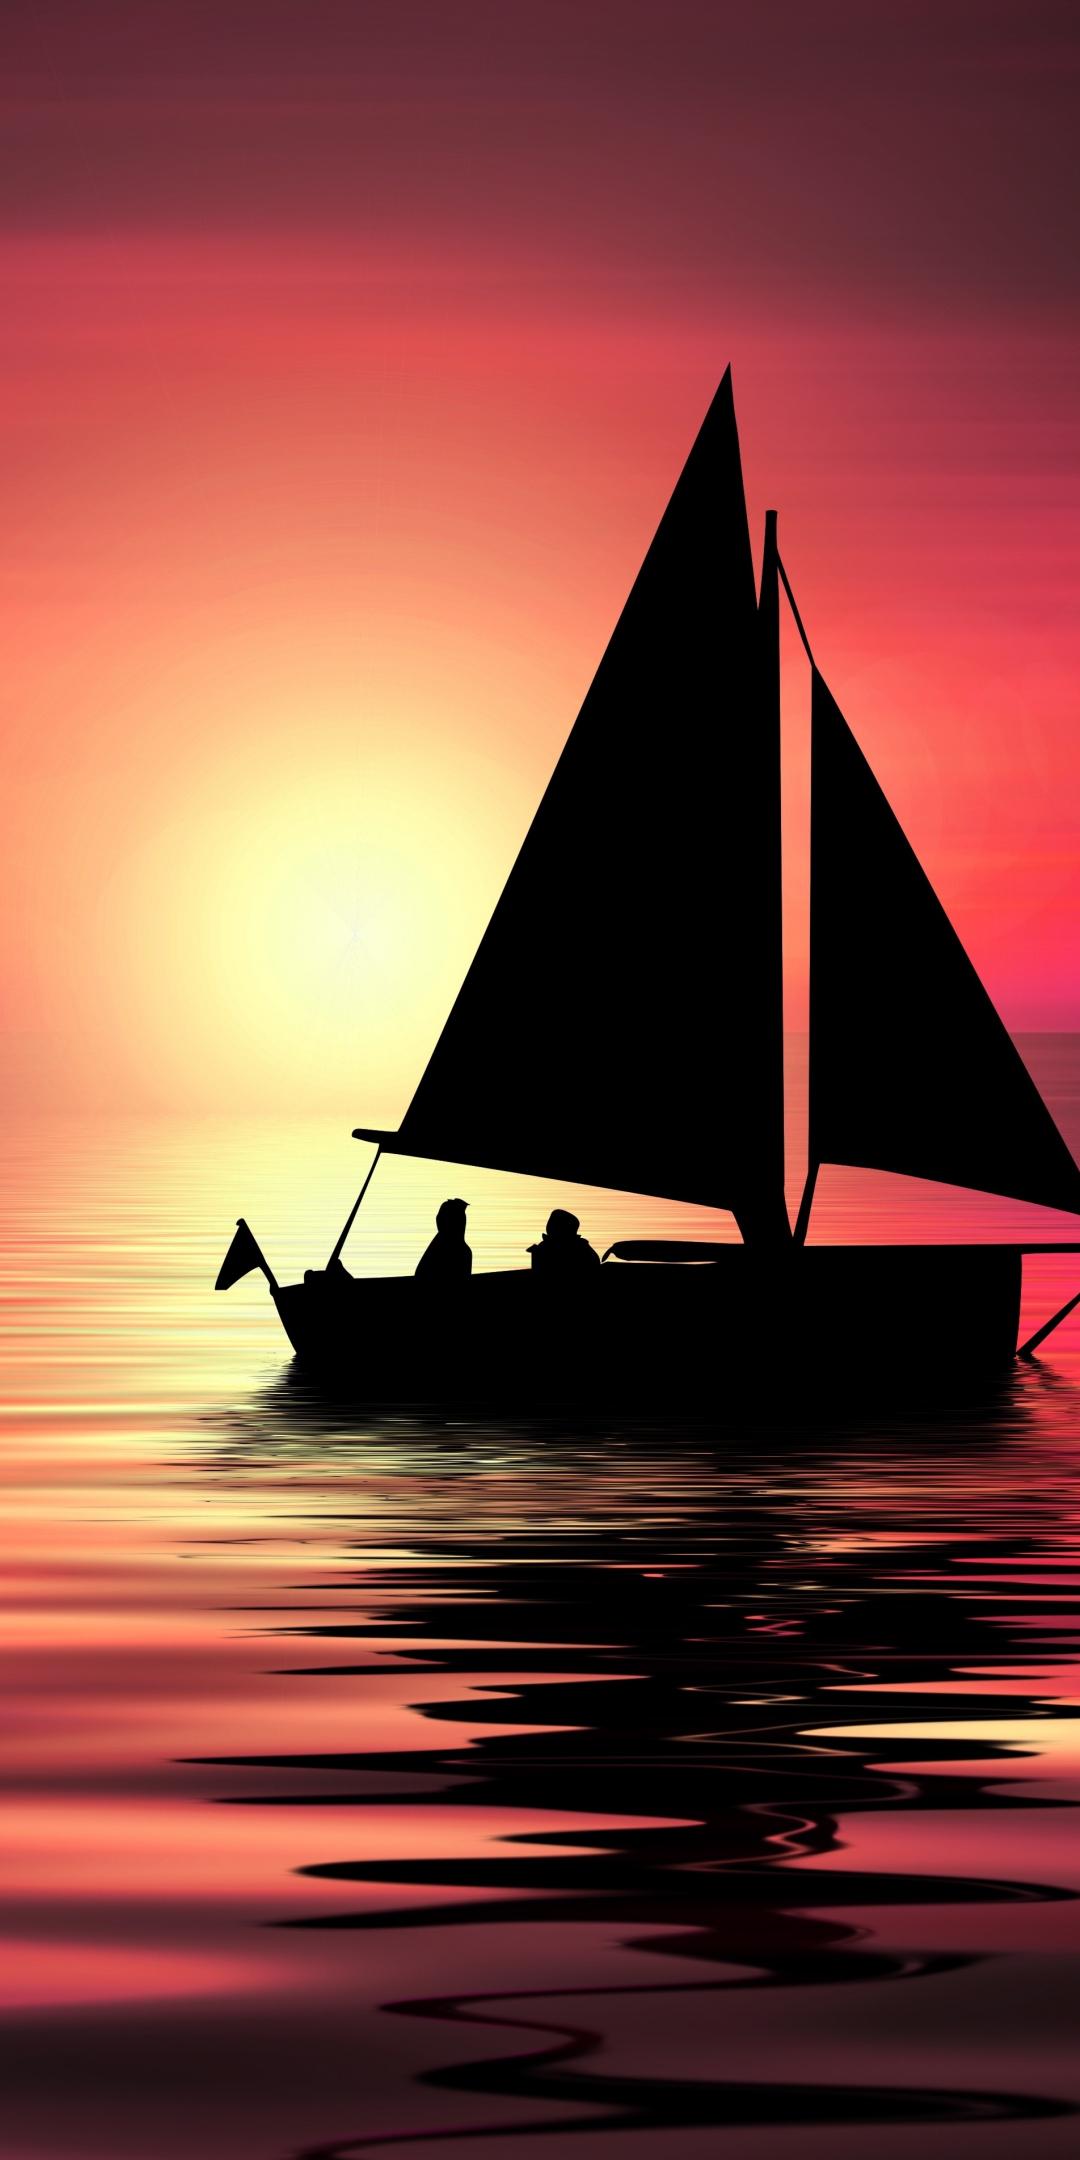 Artwork, sailboat, sunset, silhouette, 1080x2160 wallpaper